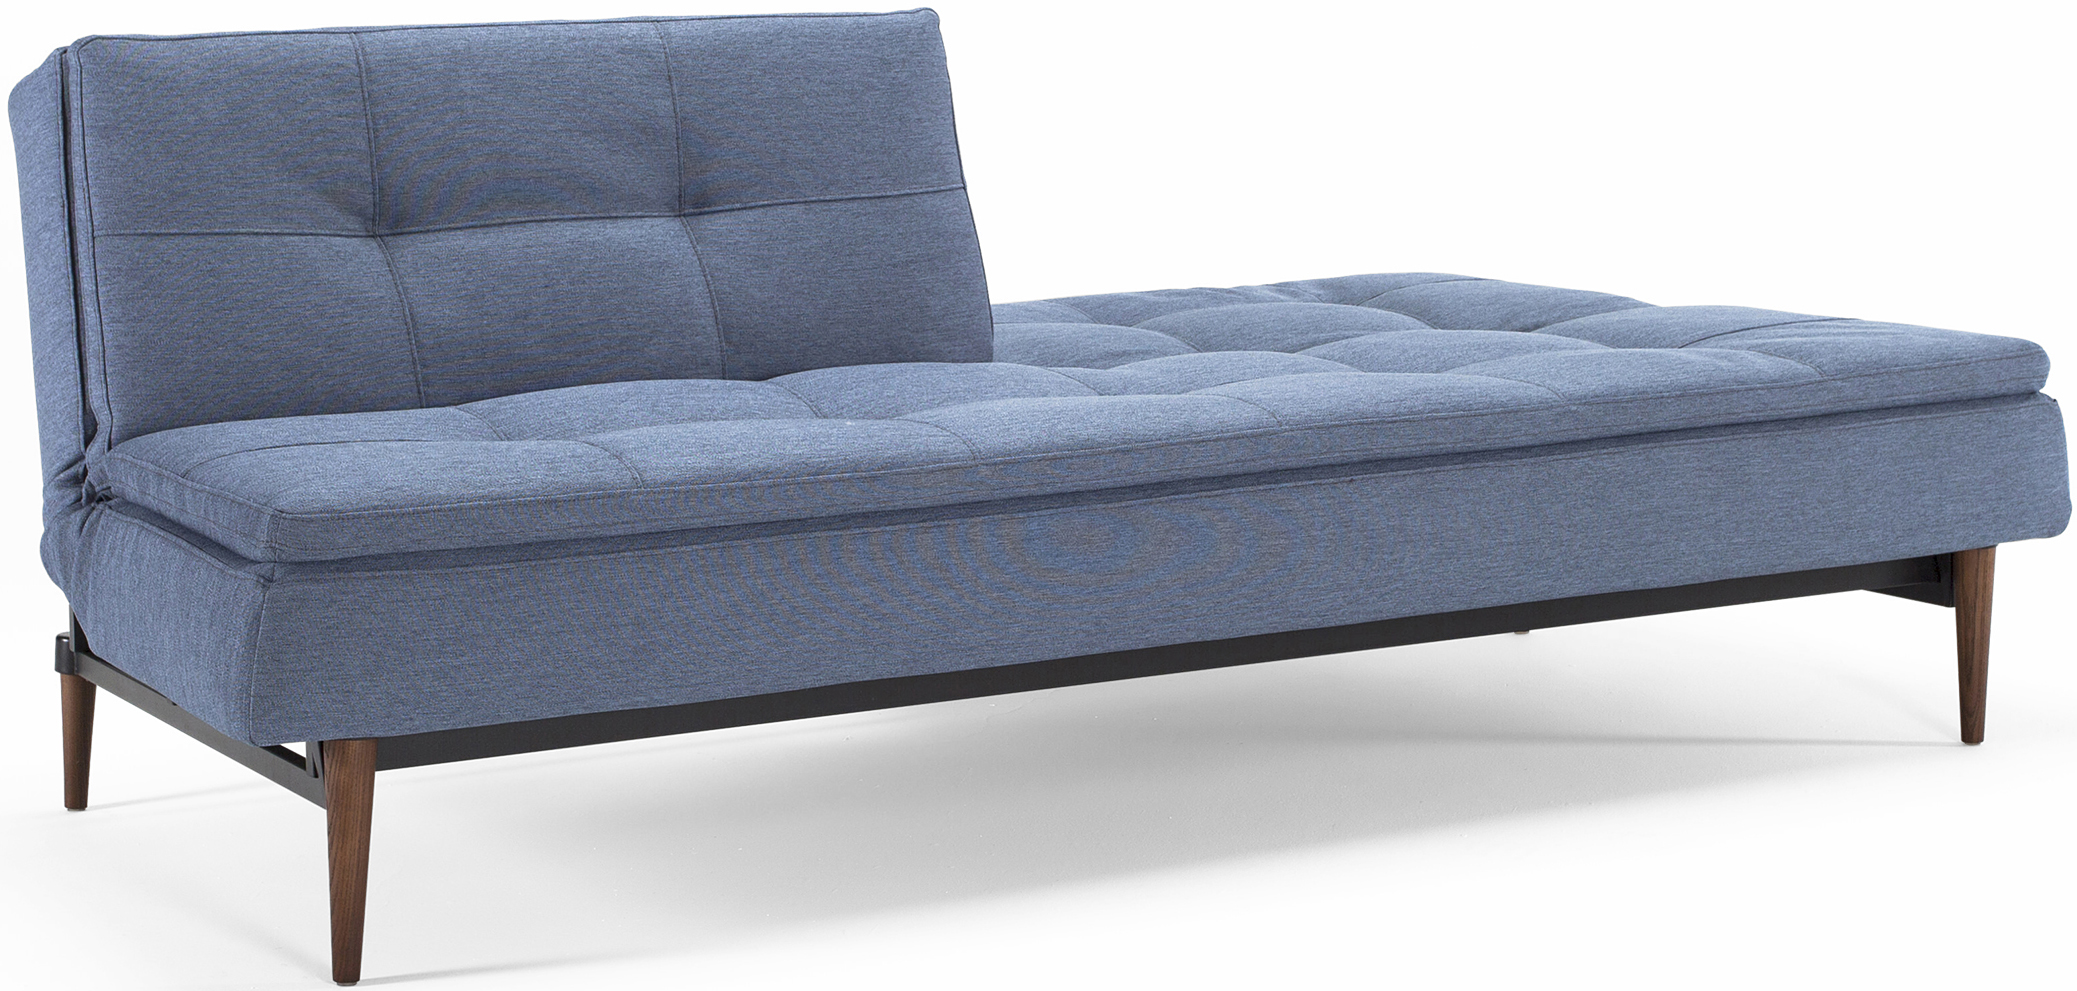 the dublexo sofa in indigo blue